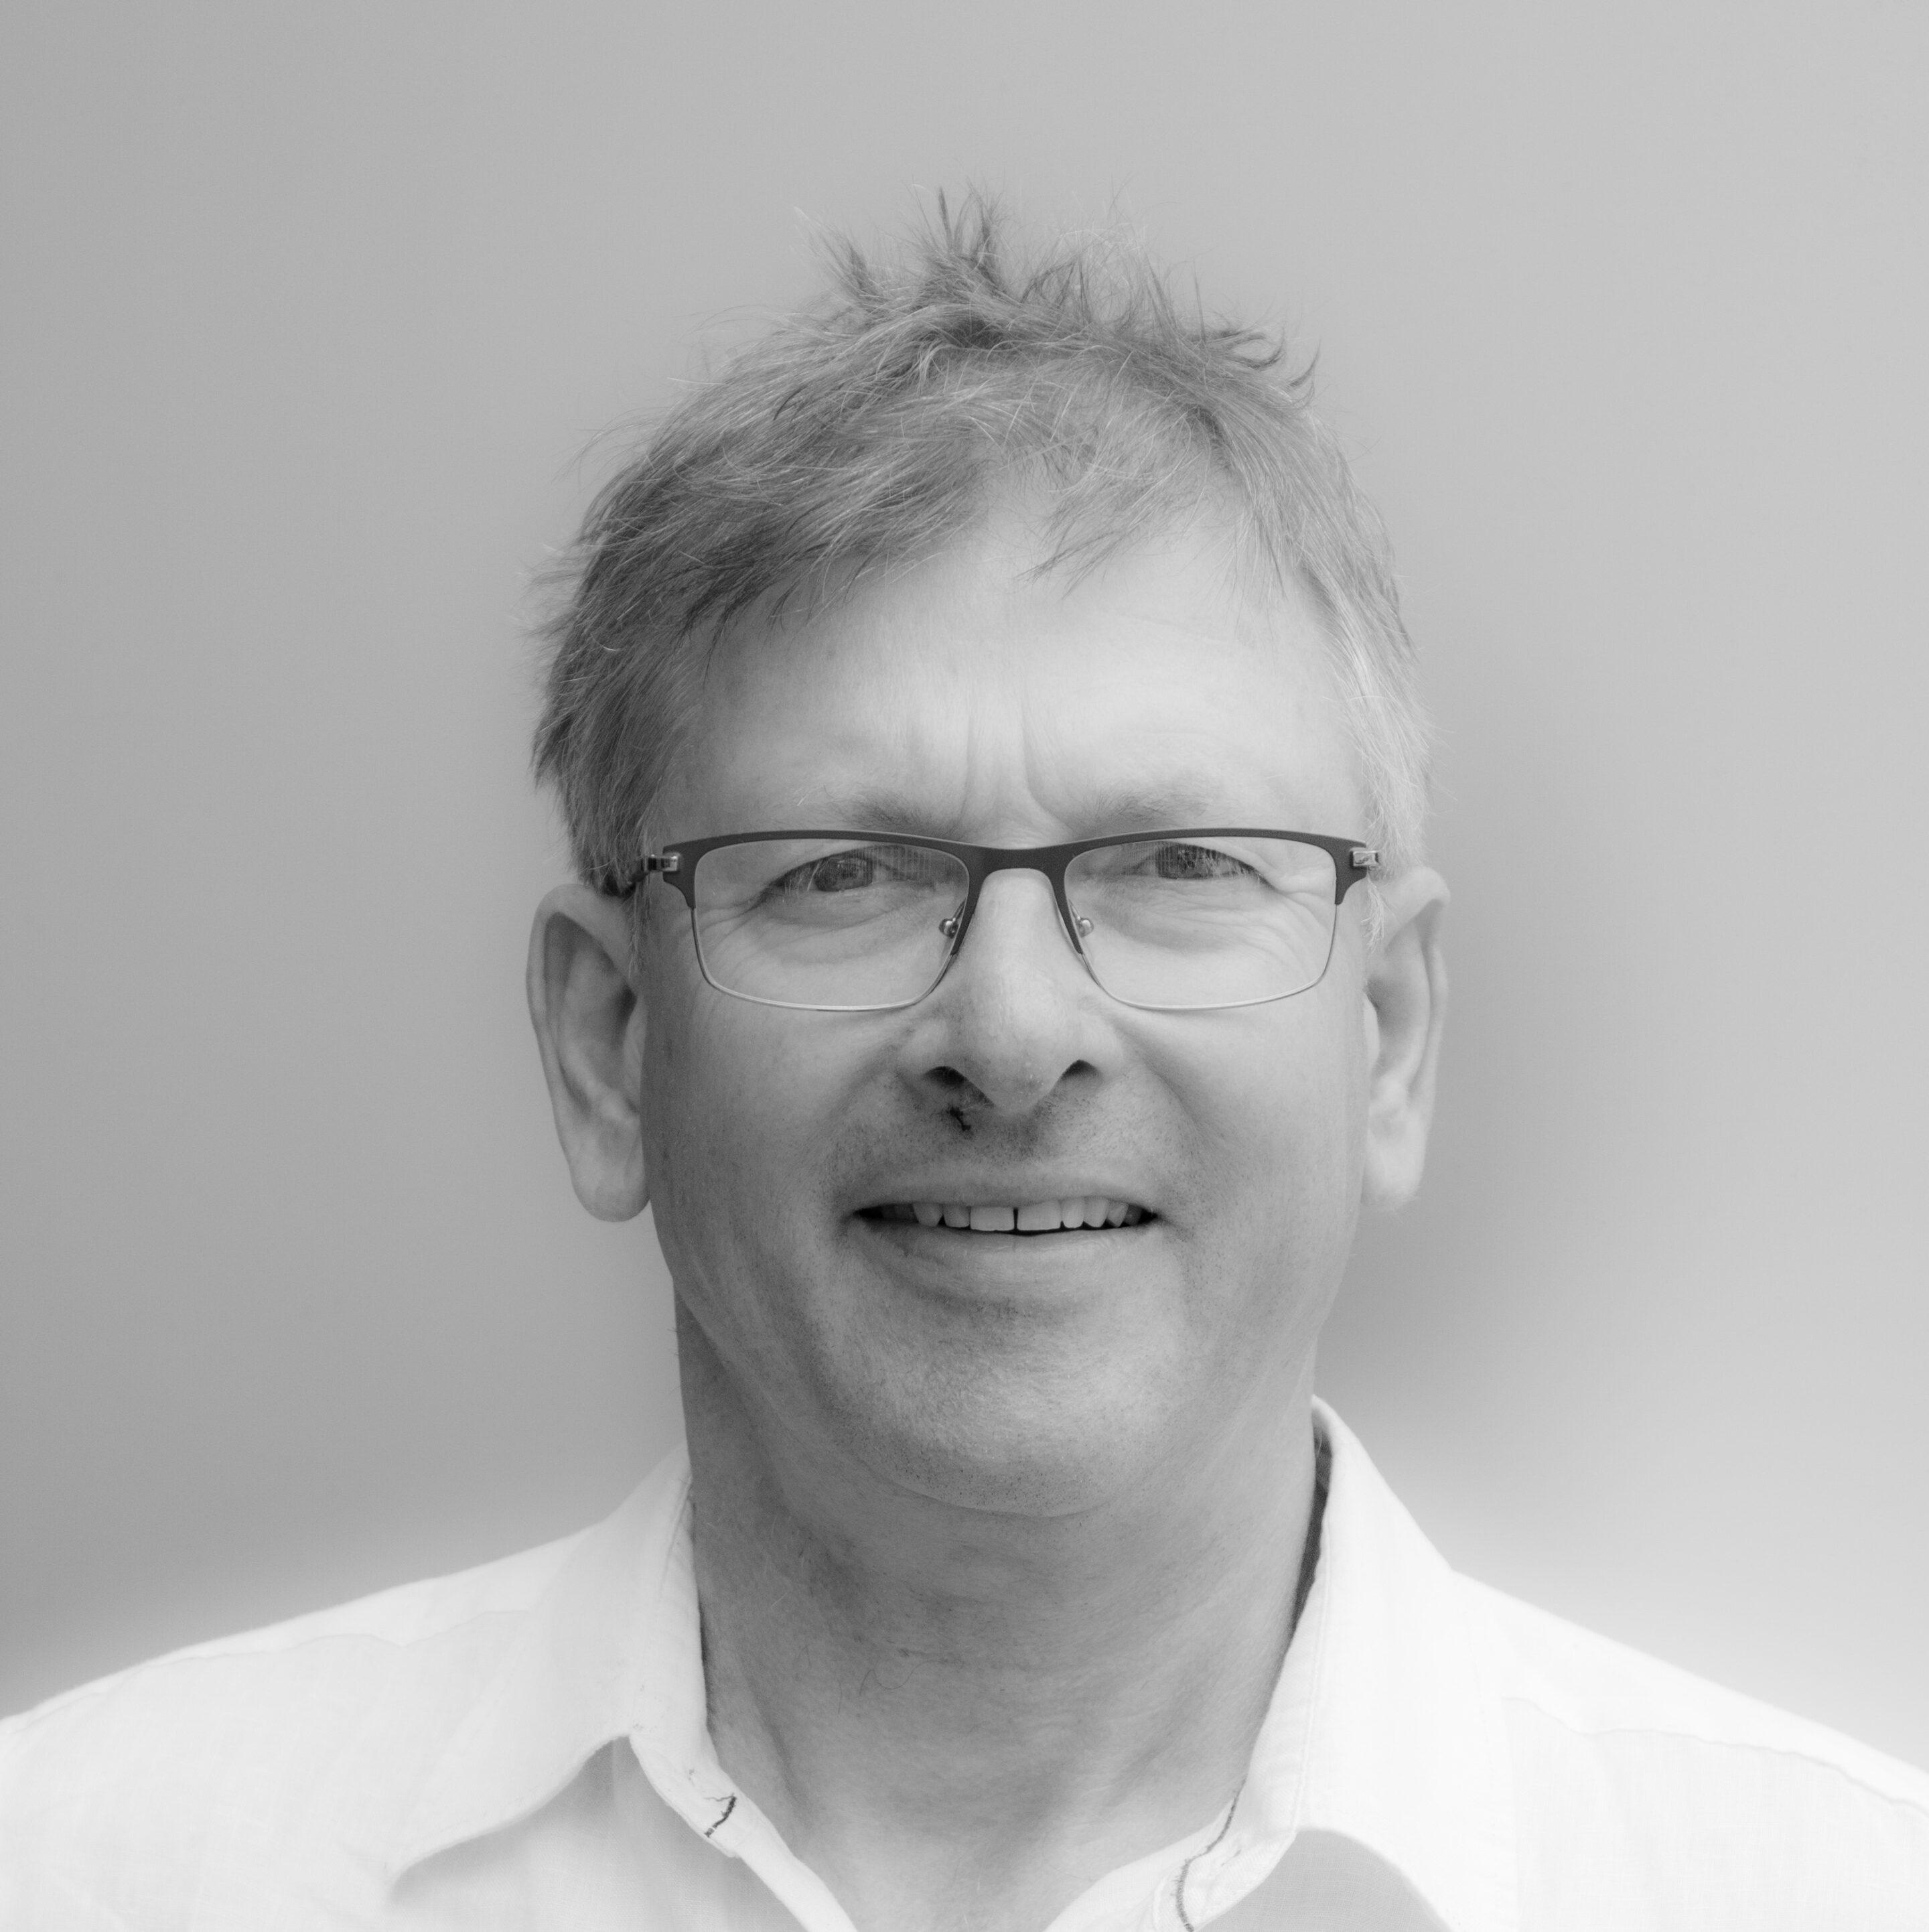 Arbeidsdeskundig Consultant Bas Bouwhuis